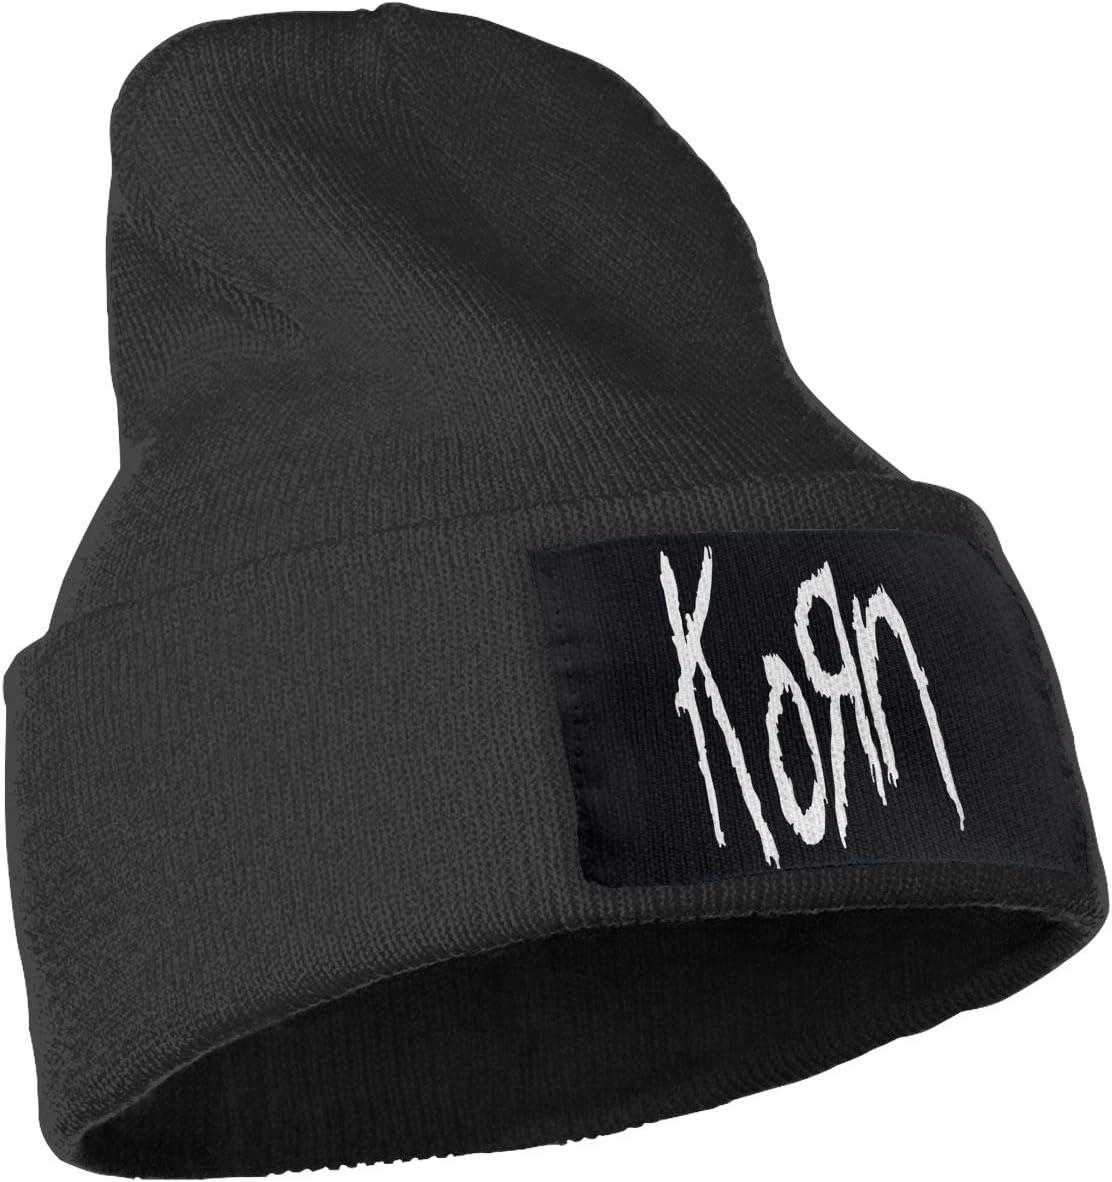 SmallHan Mens /& Womens Korn Skull Beanie Hats Winter Knitted Caps Soft Warm Ski Hat Black